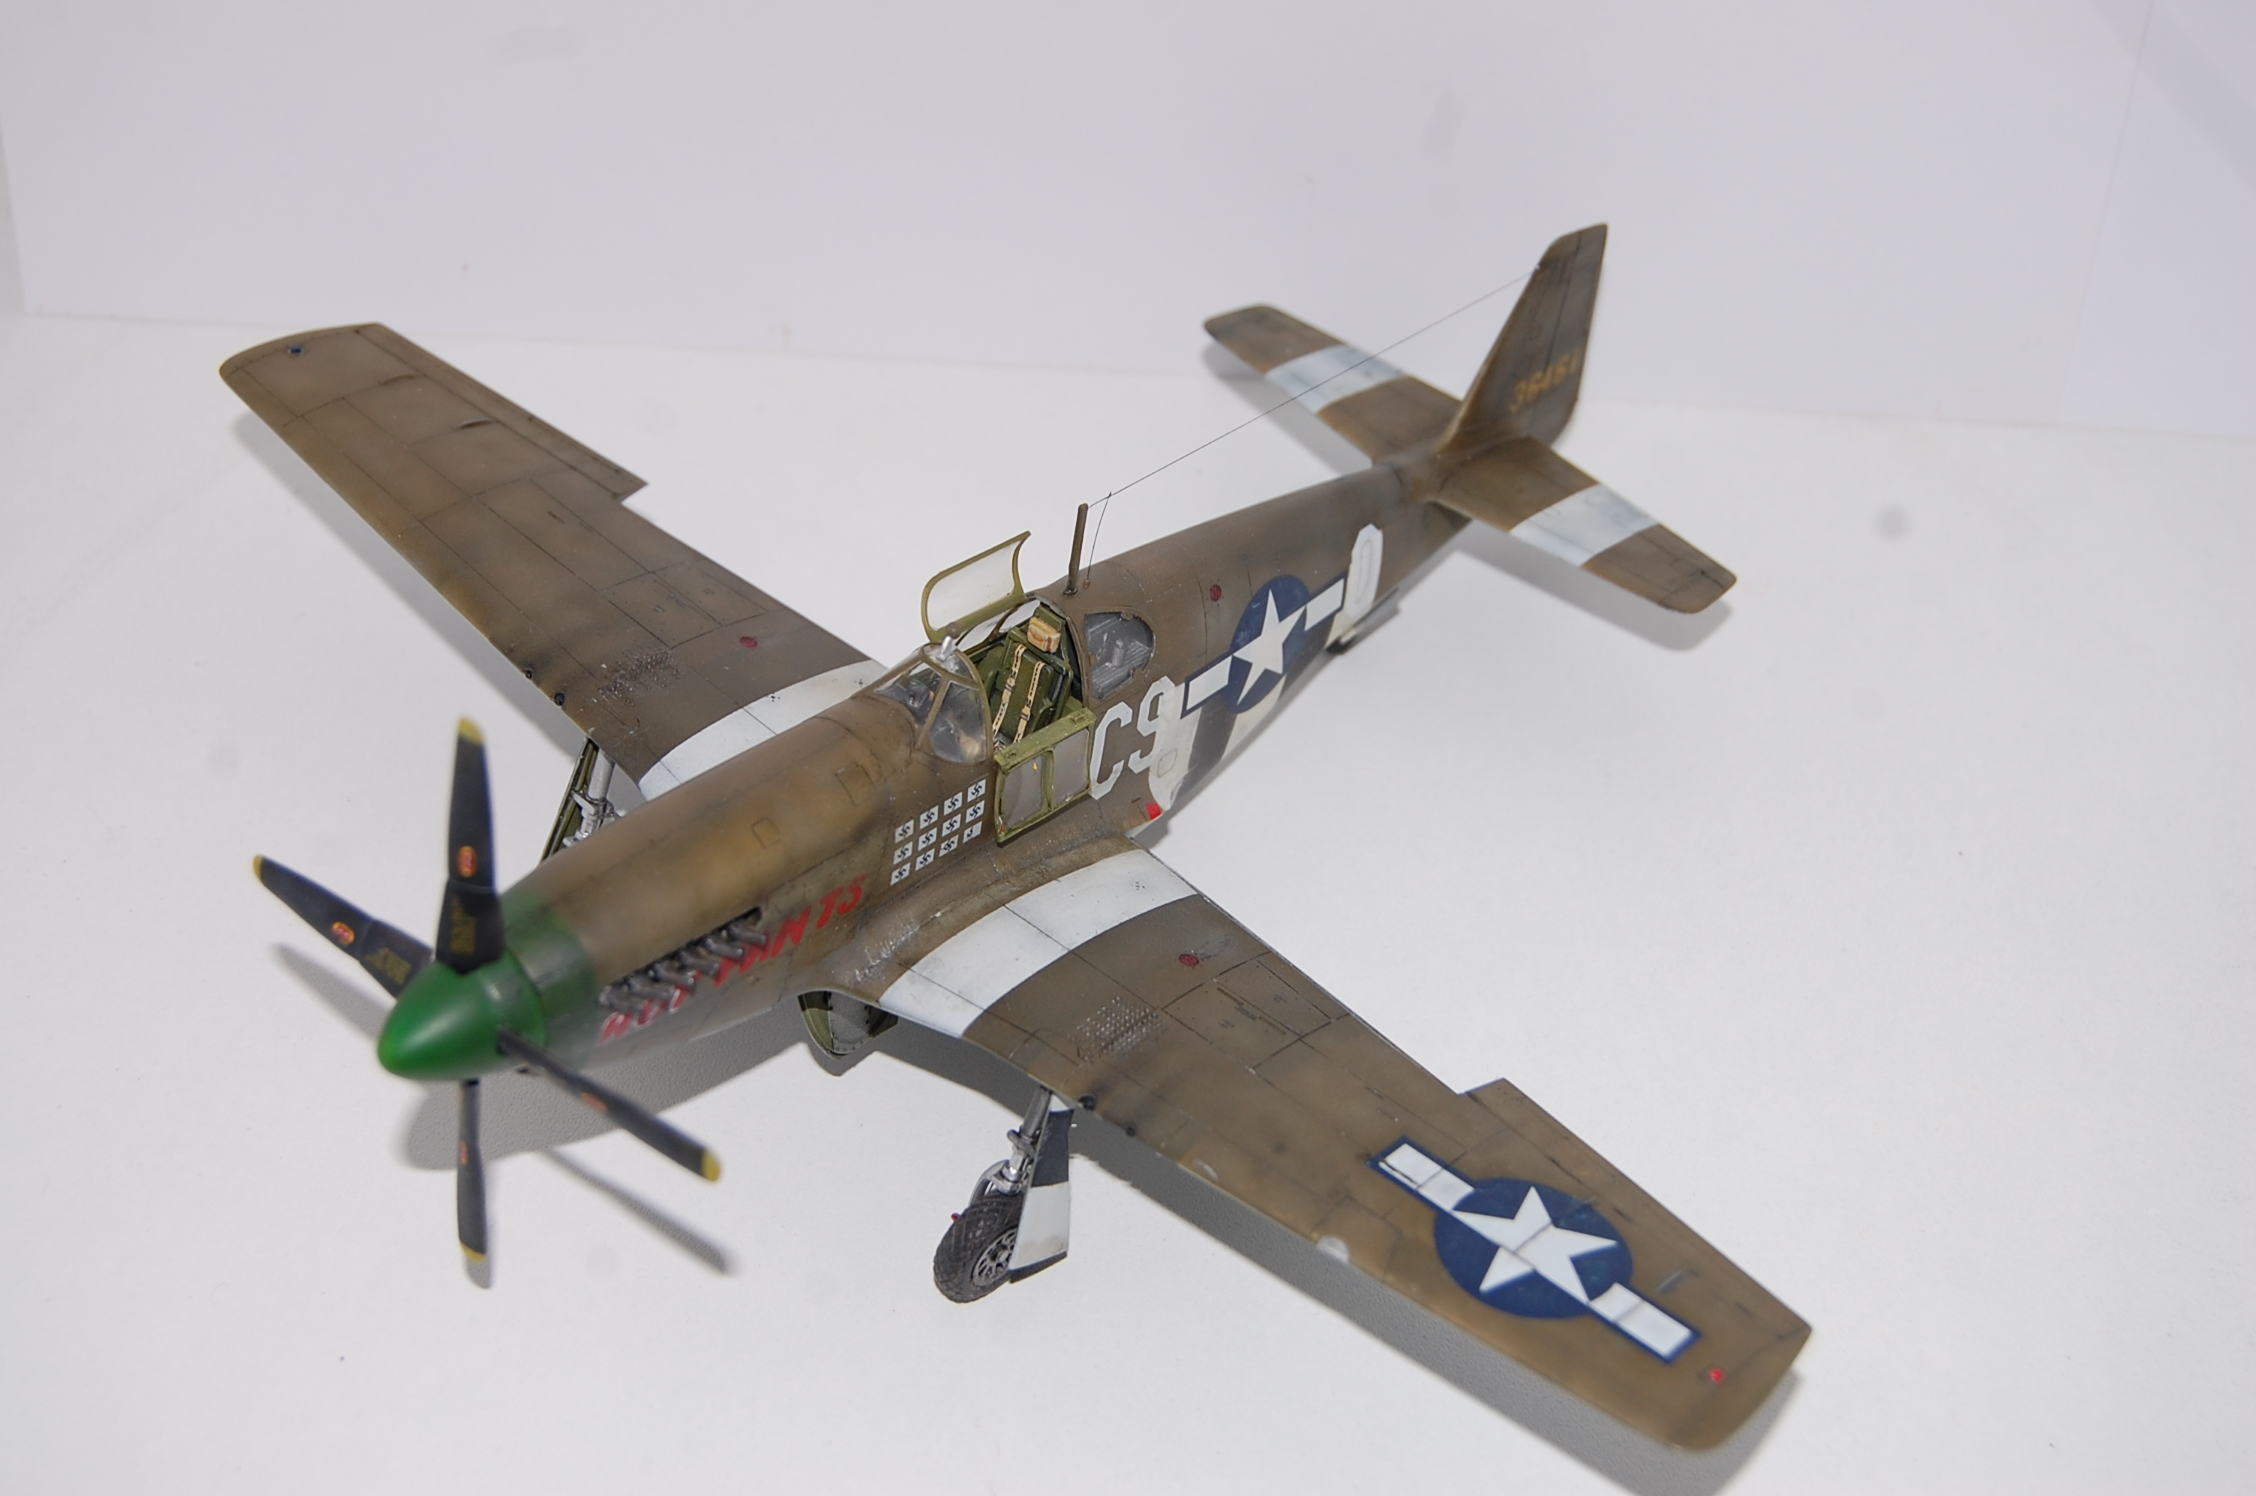 P-51 B Tamiya monture du Lt Wilson K.Beker 359 Th FG Dsc_3233